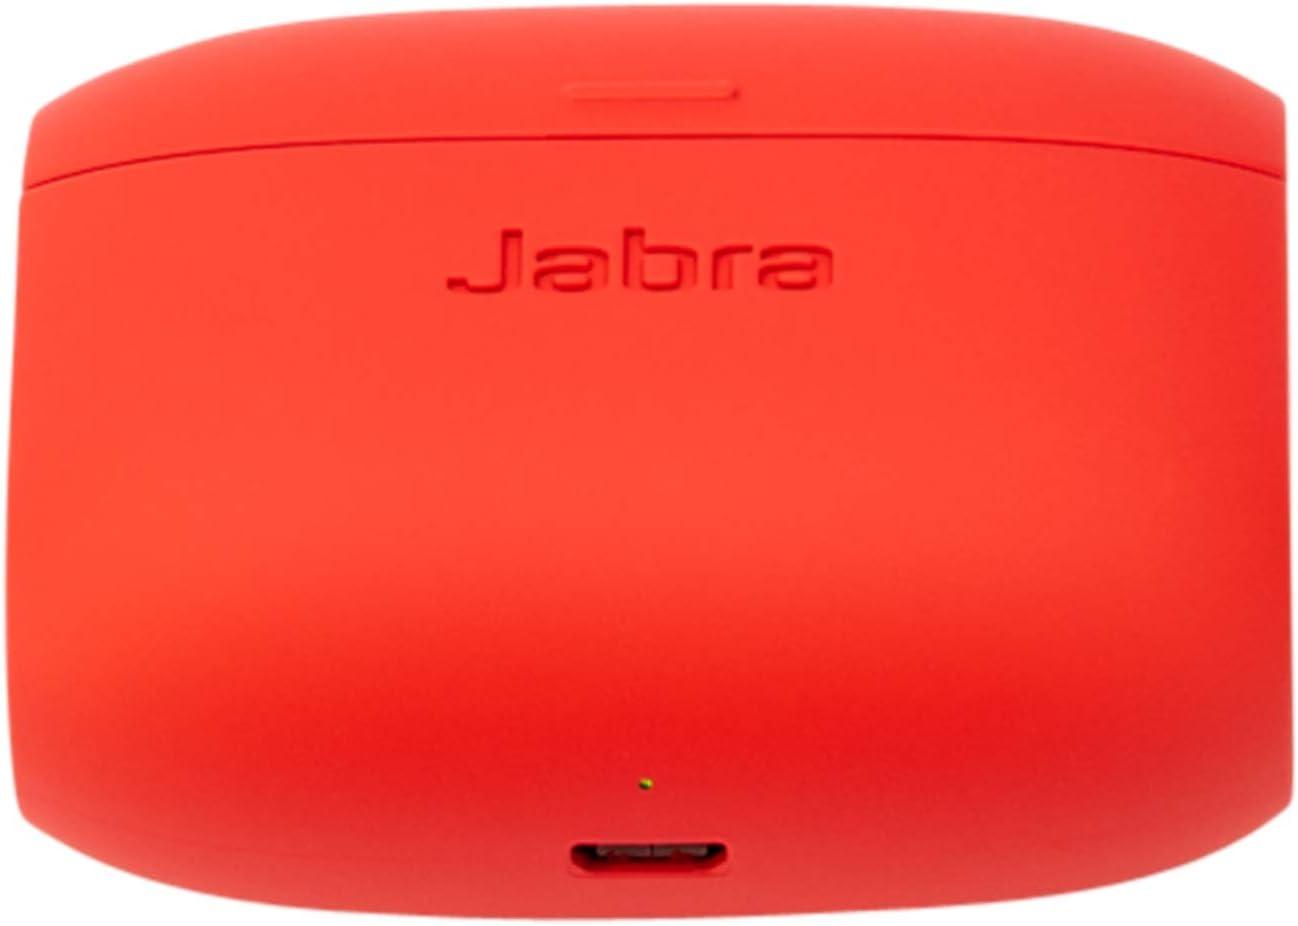 Amazon Com Jabra Elite Active 65t Replacement Charging Case Red 100 68600001 00 Electronics